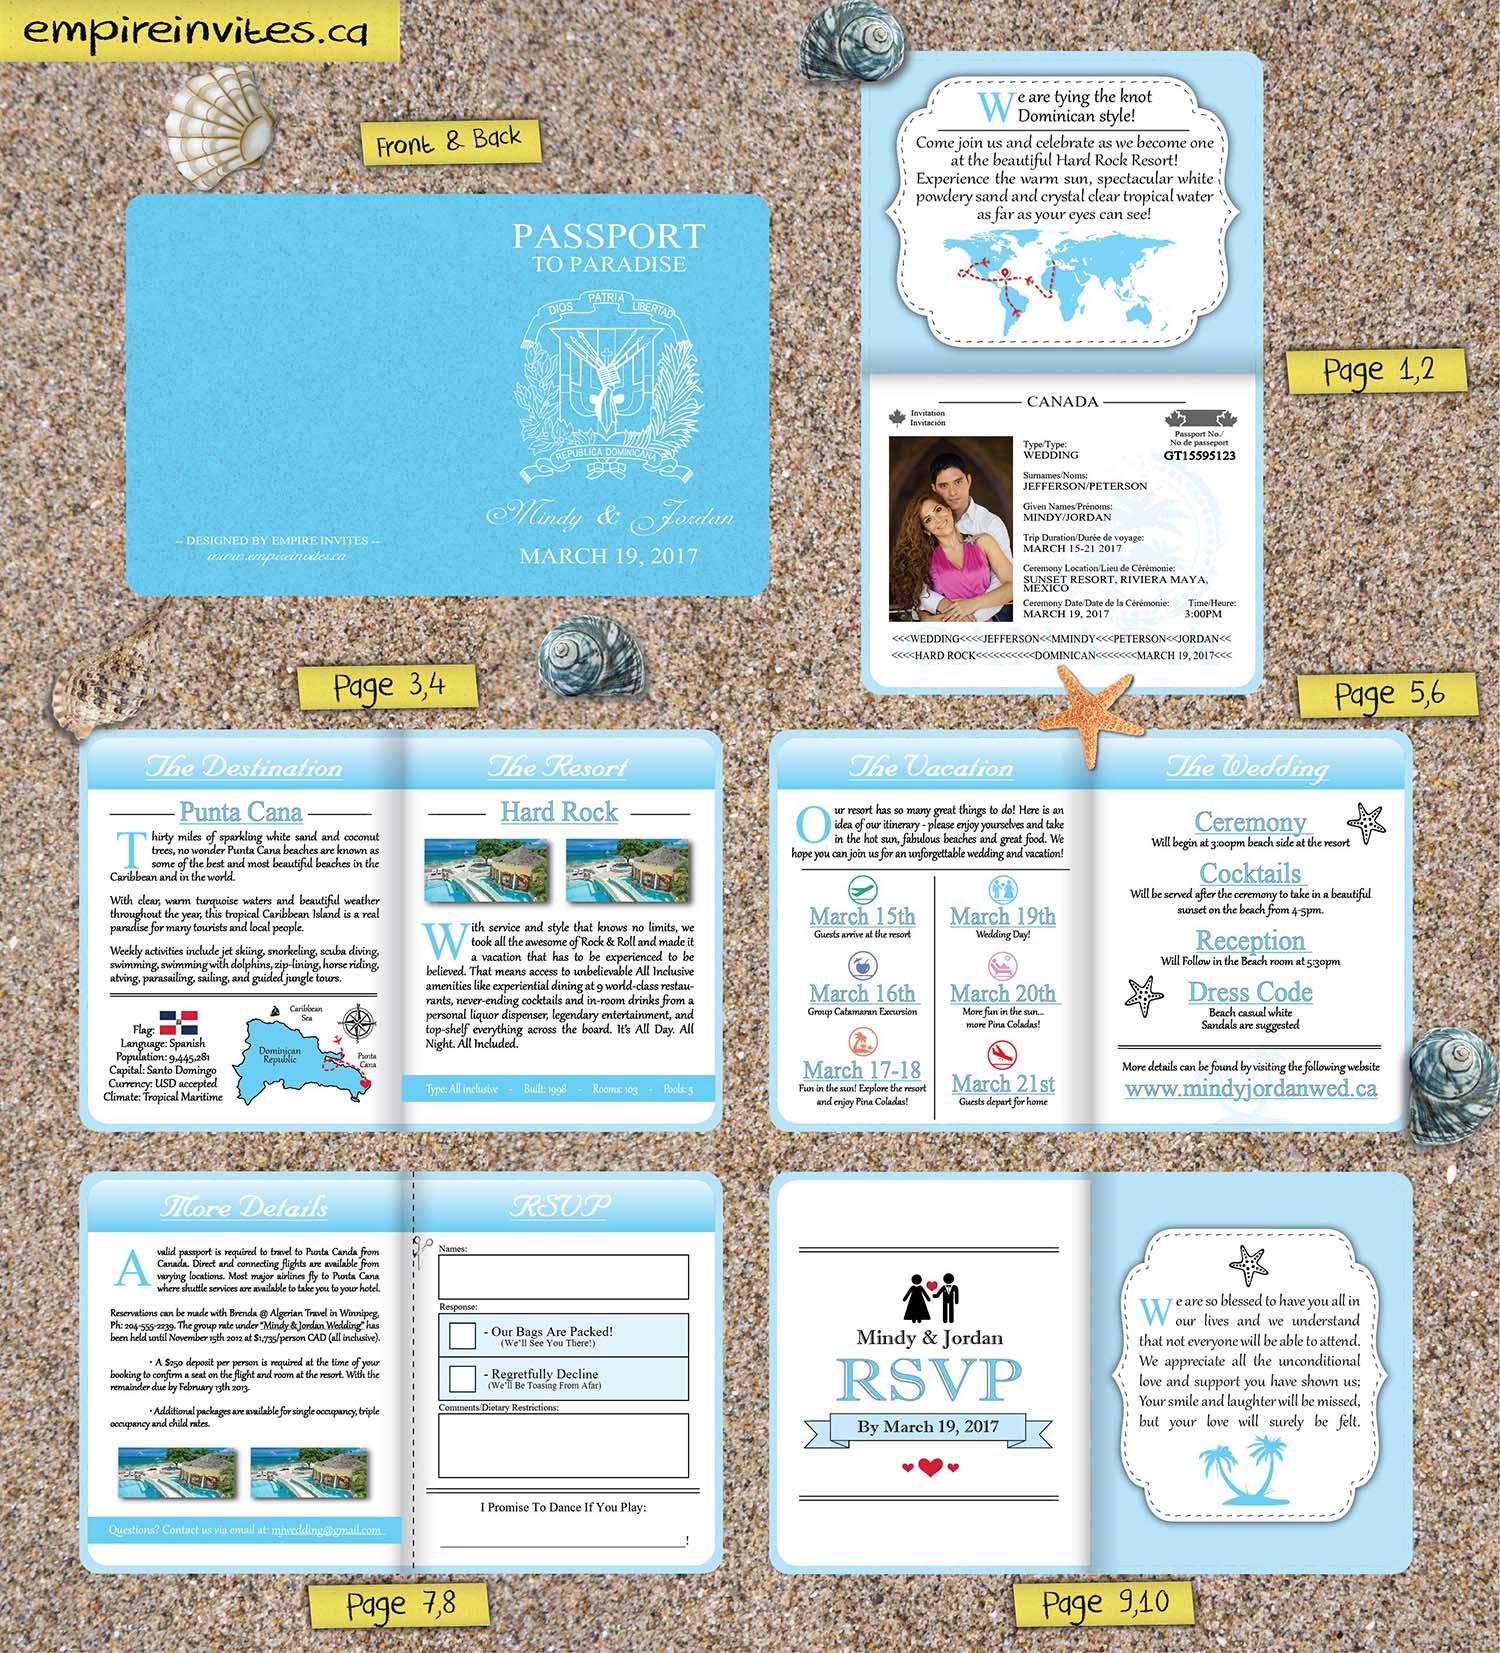 Wedding Invitation Envelopes Canada: Custom Destination Passport Wedding Invitations From